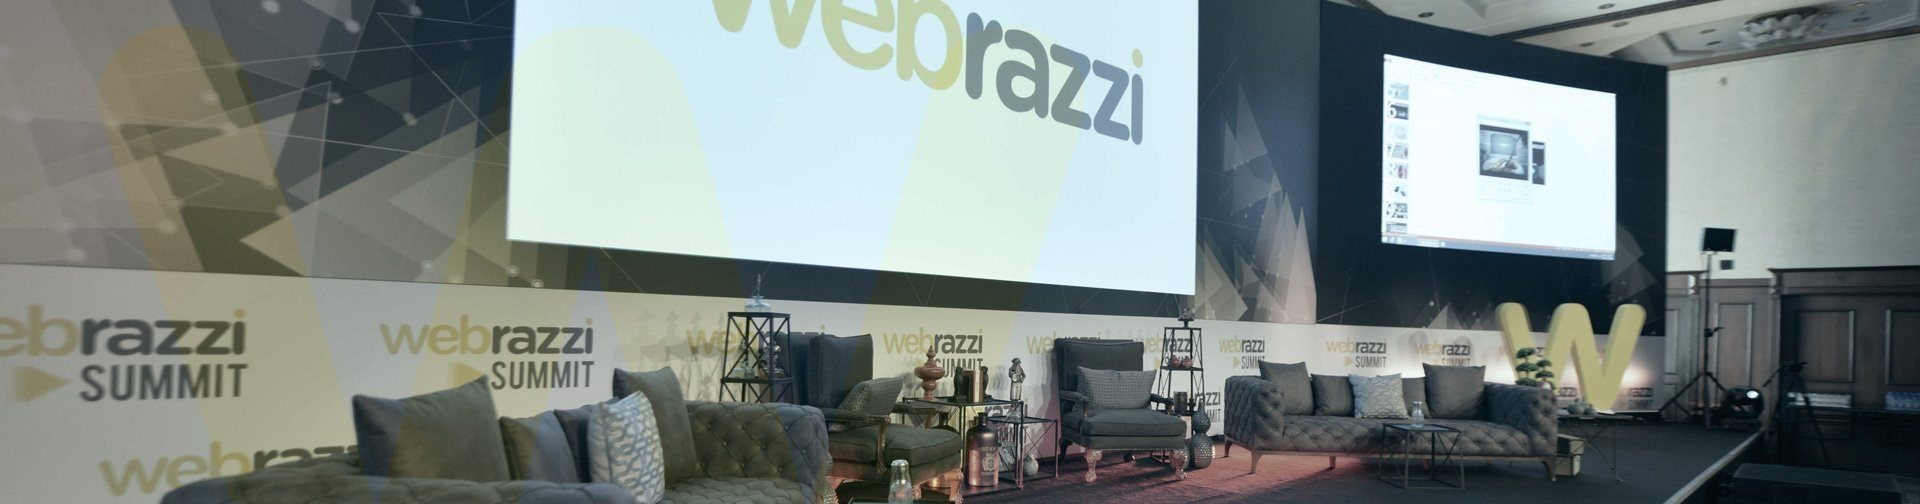 webrazzi-arena-2015-gorsel